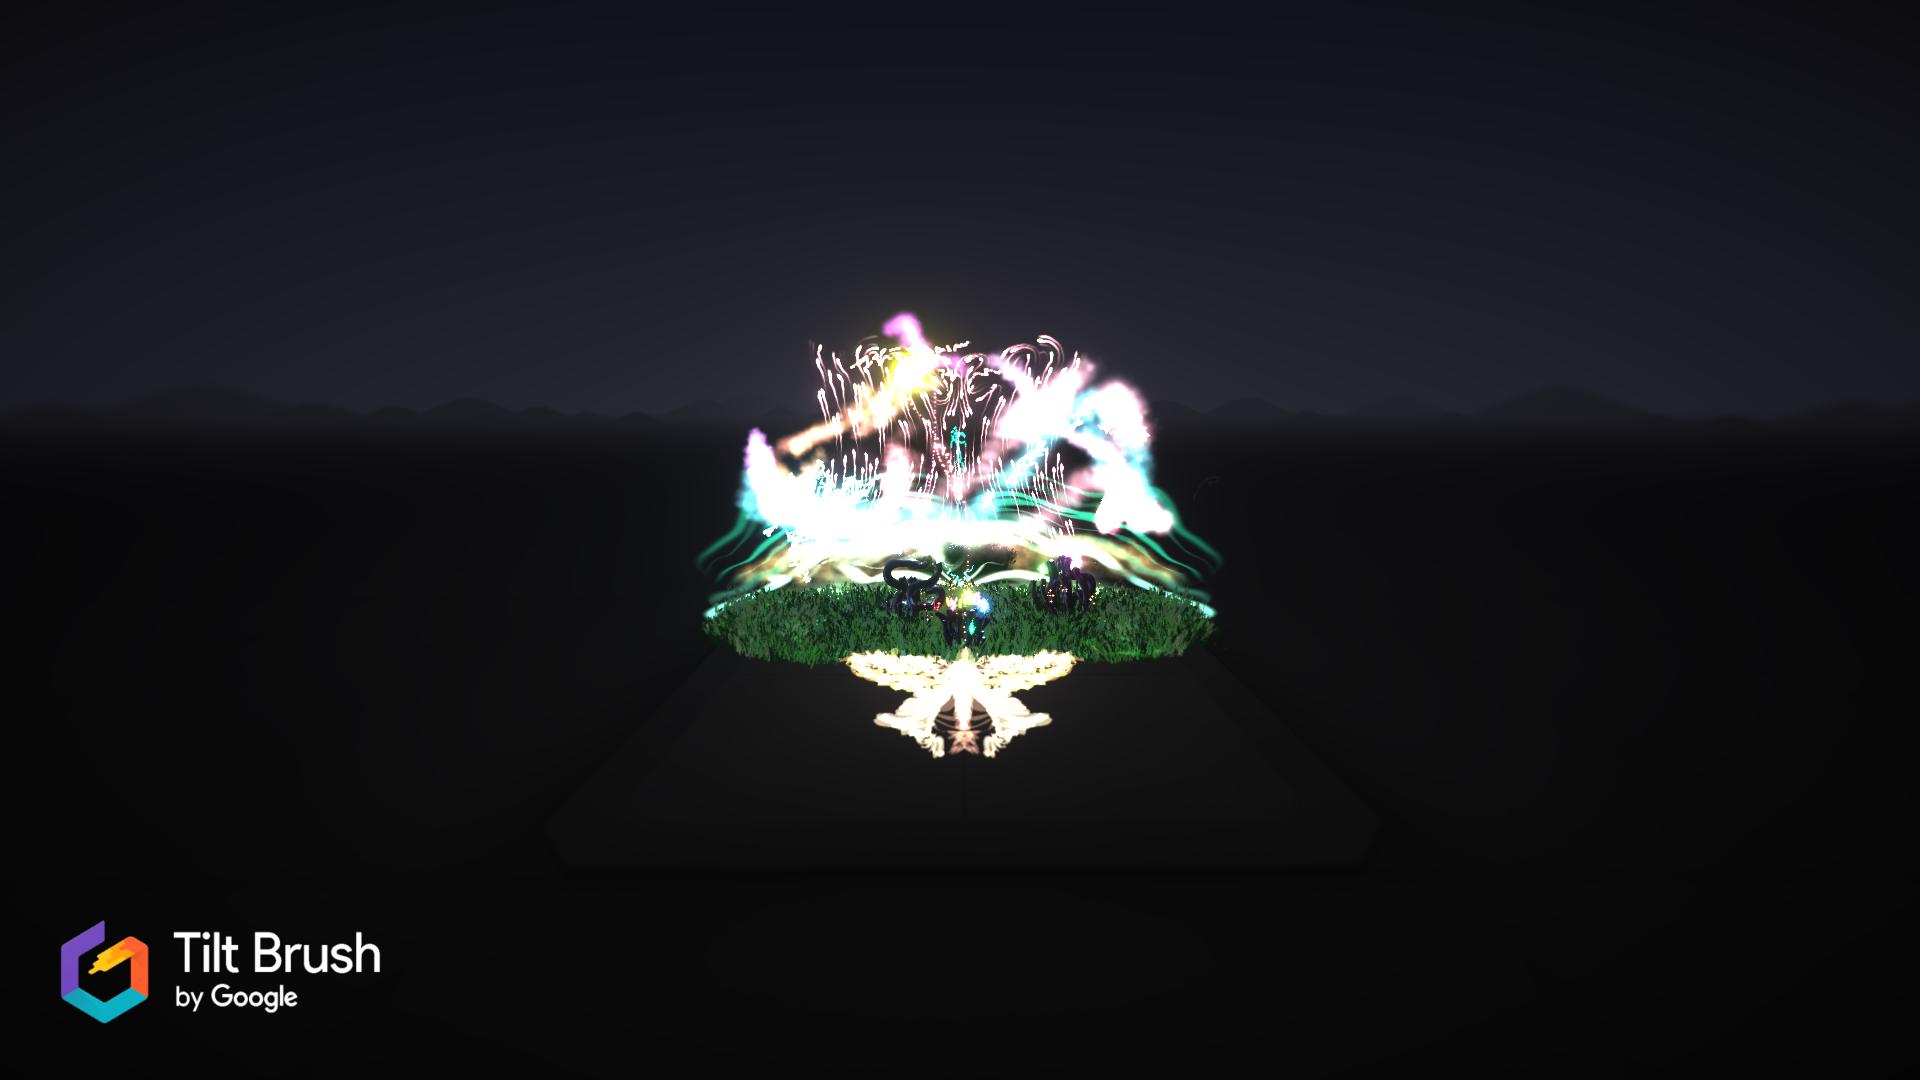 Artlink VR - Explorative Google Tilt Brush paintings by non-game artists